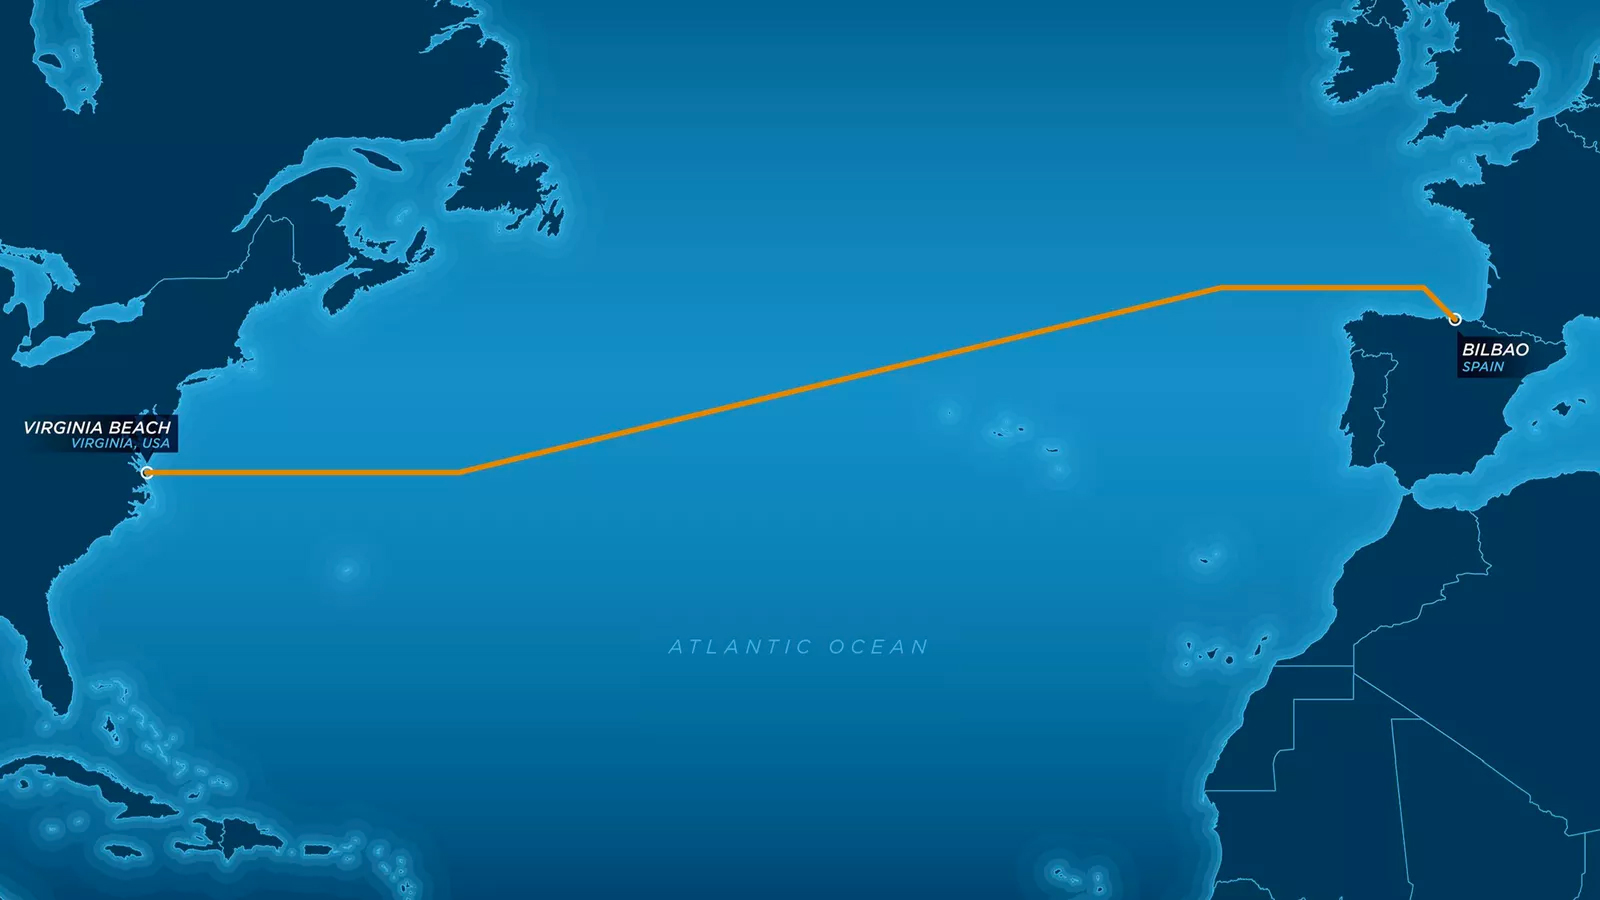 Microsoft соединила США иИспанию мощнейшим интернет-кабелем